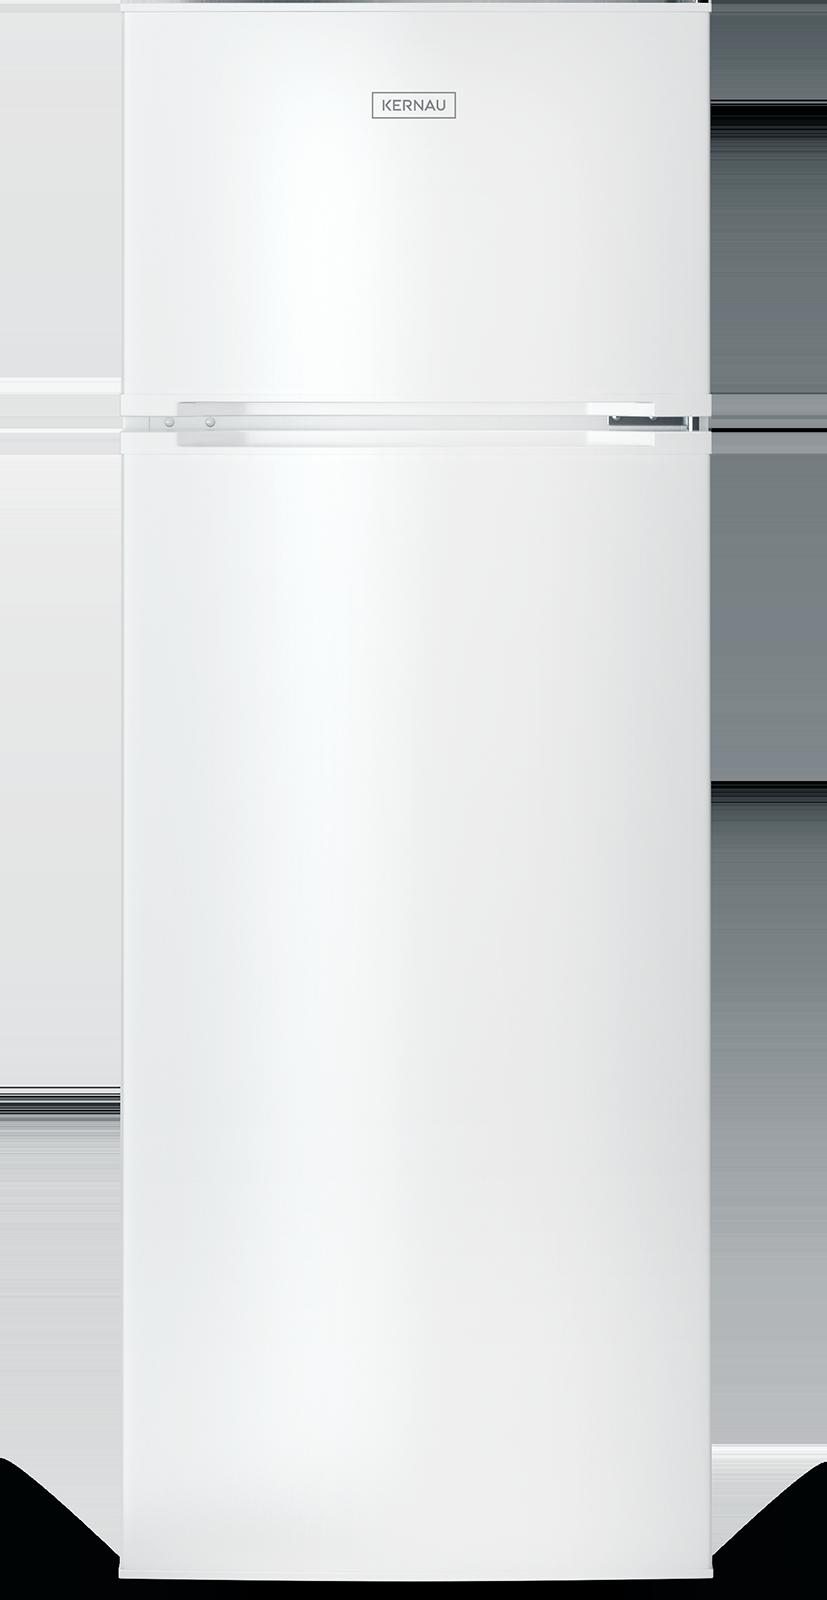 Freistehende Kühlschrank Kernau KFRT 12151 W